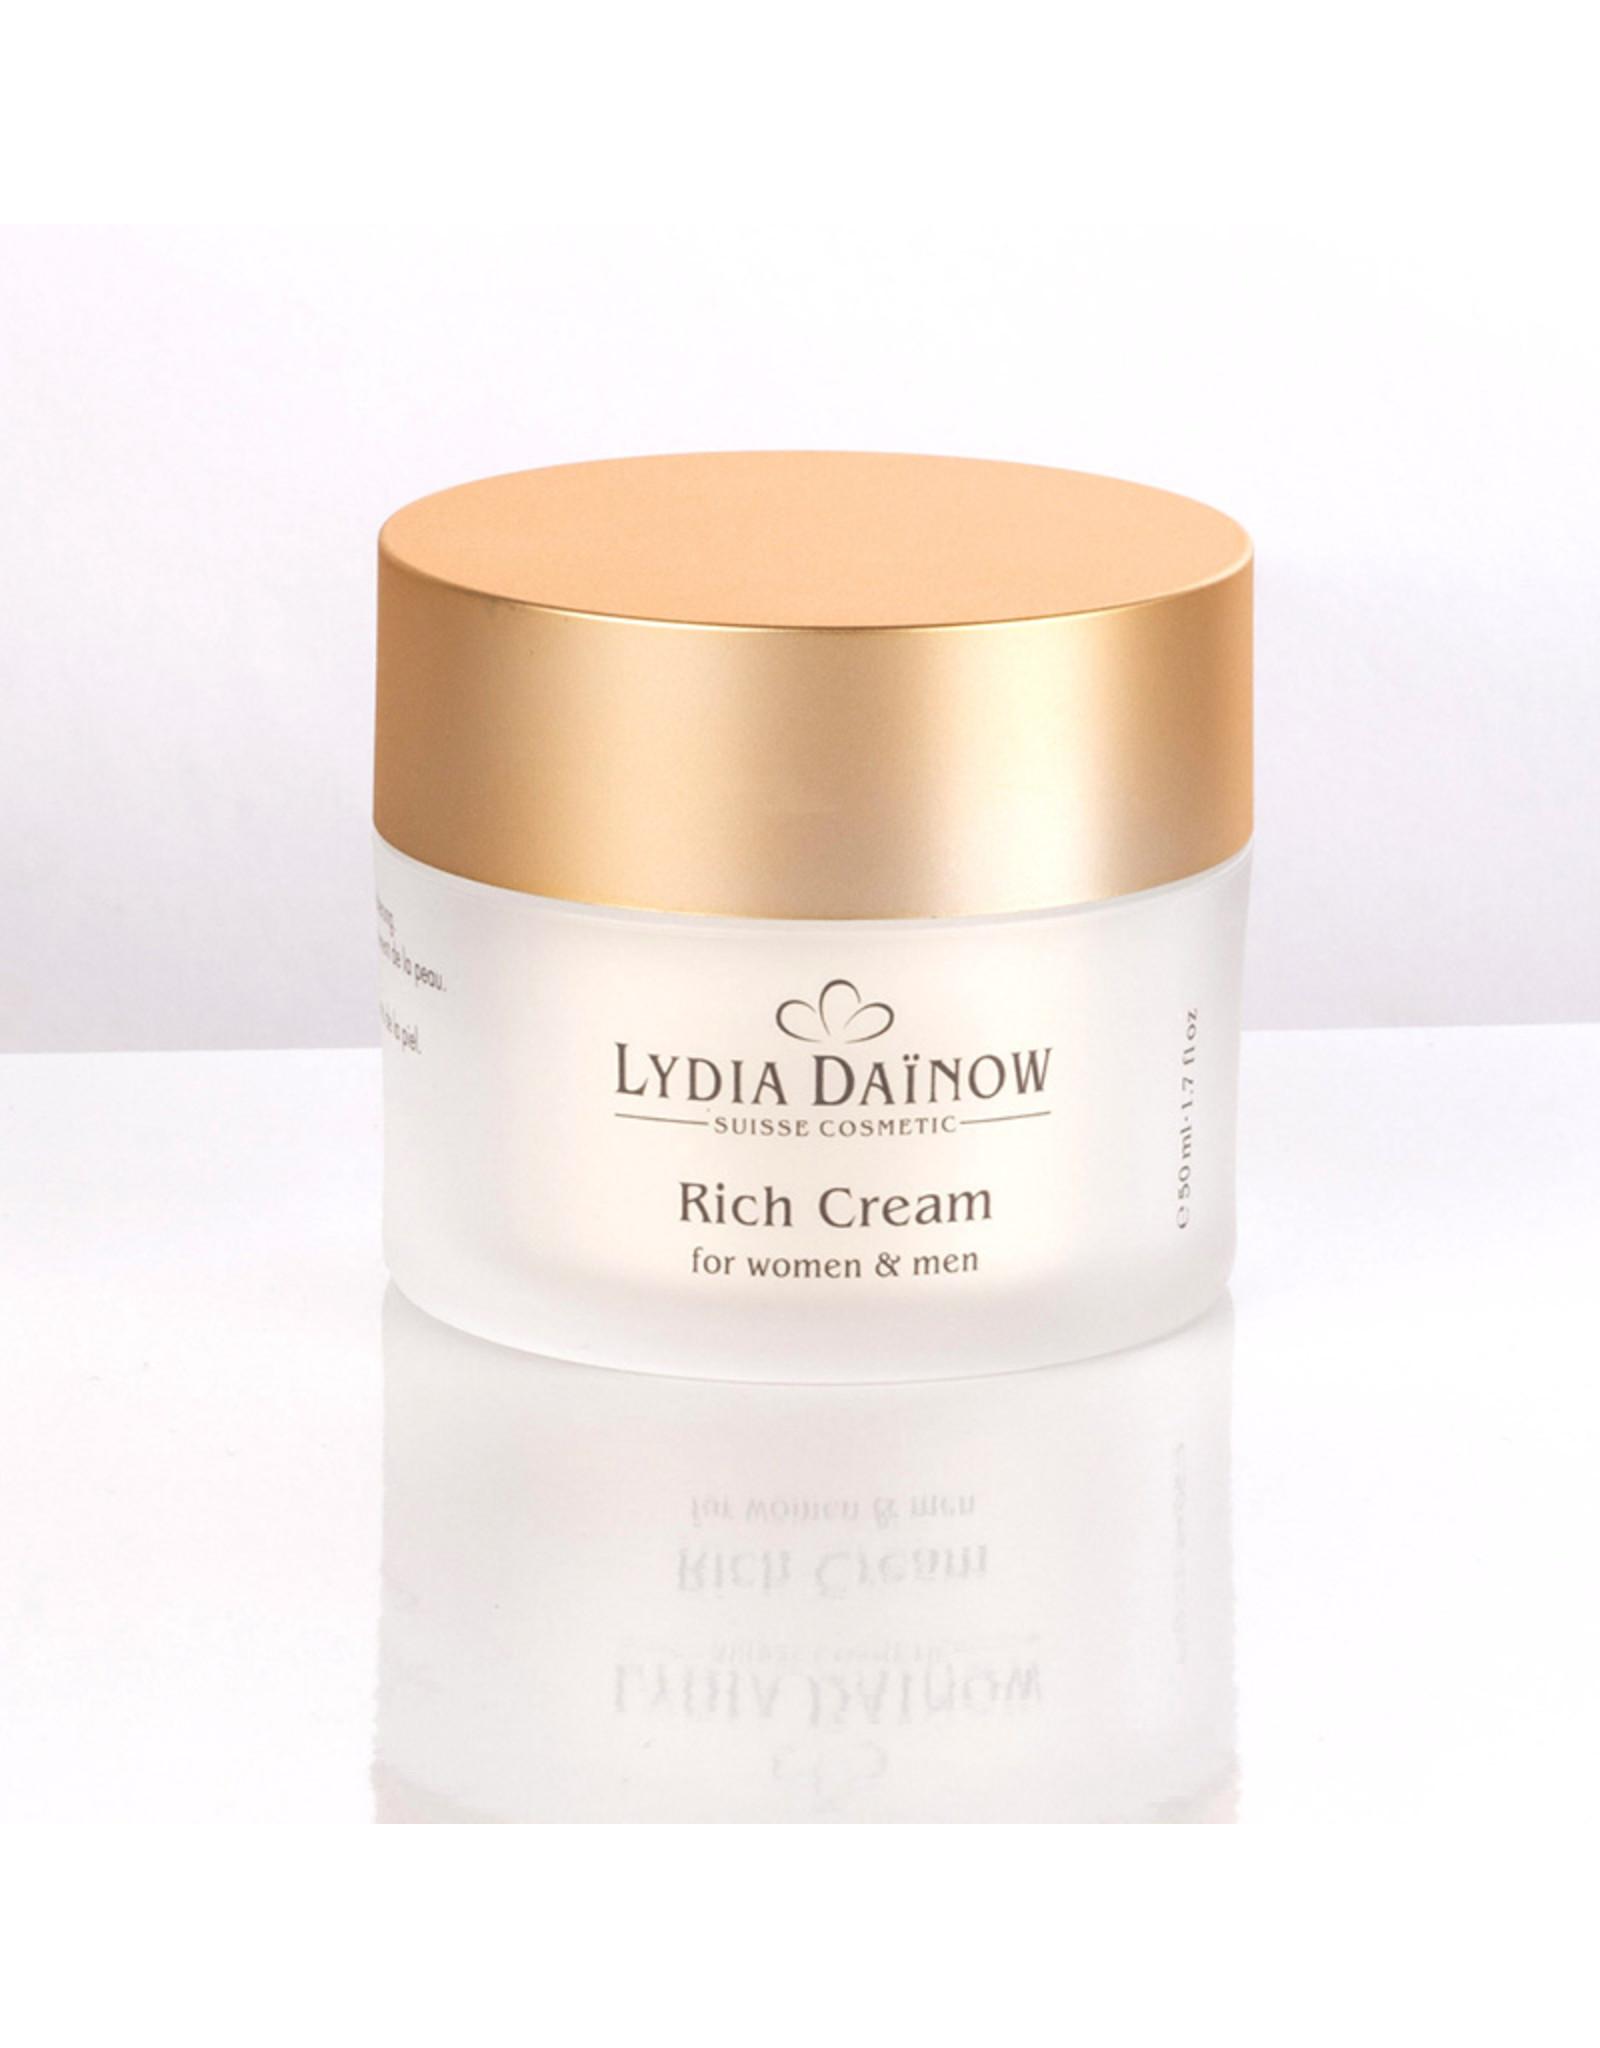 Lydïa Dainow Evolution Rich Cream - Crème de soin riche